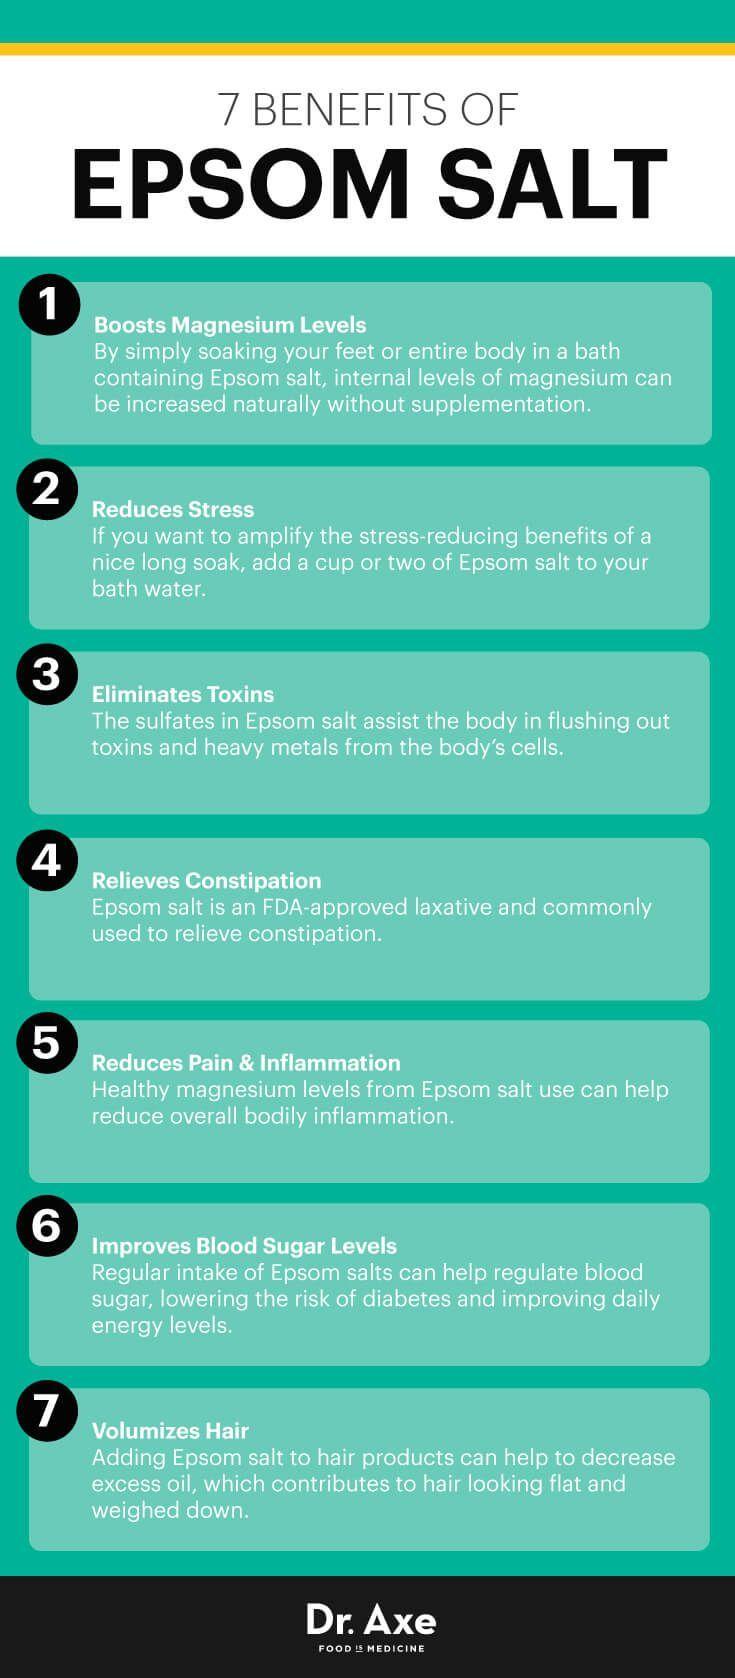 Epsom Salt — The Magnesium-Rich, Detoxifying Pain Reliever - Dr. Axe